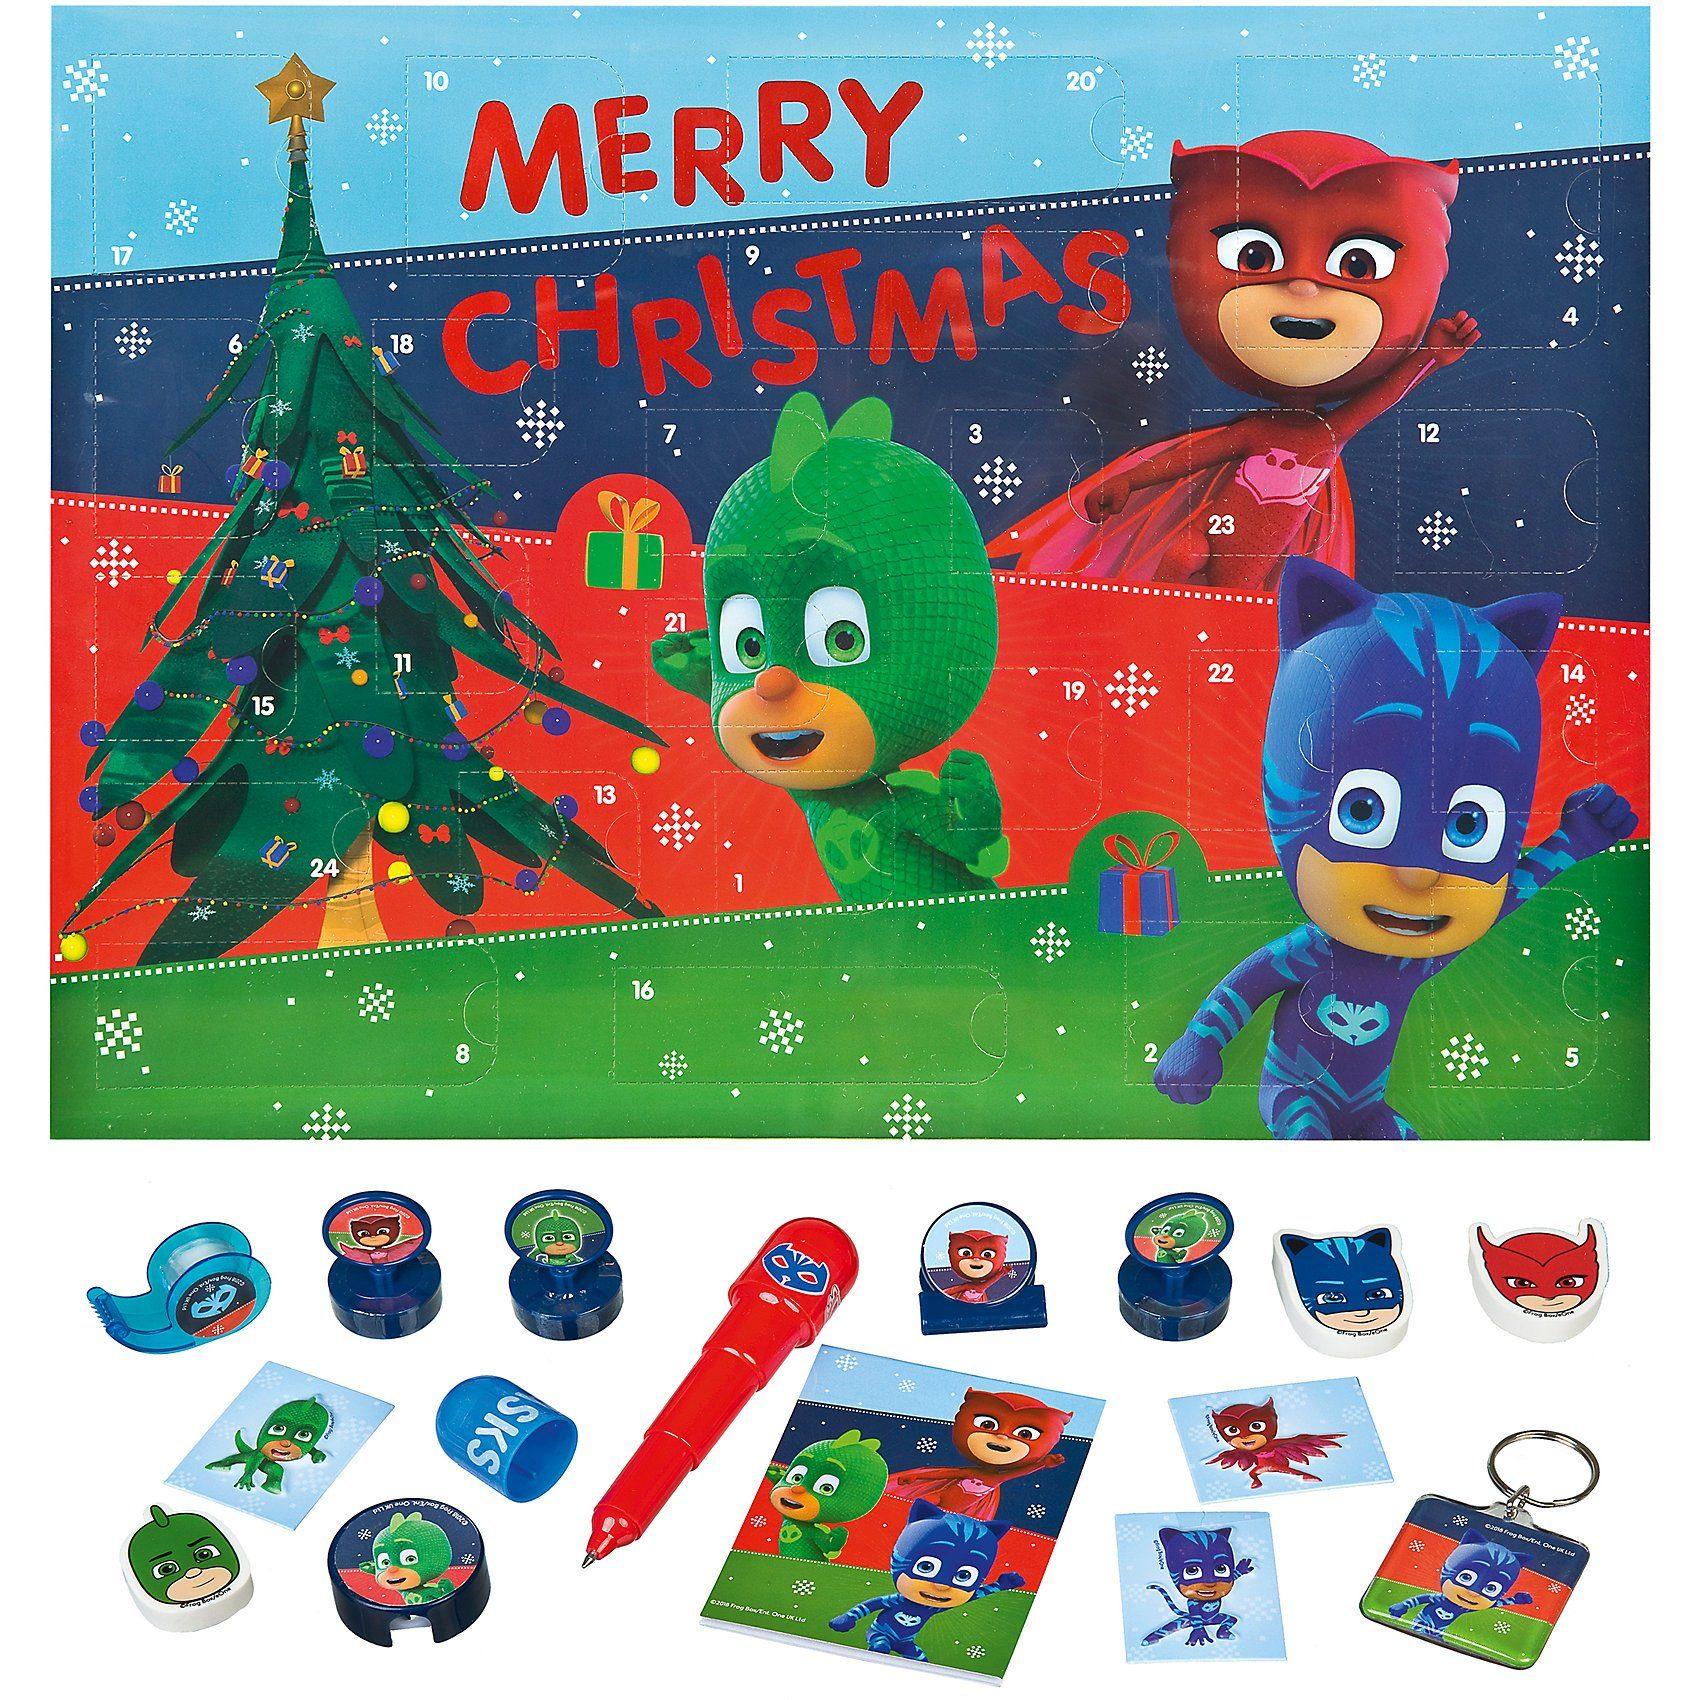 UNDERCOVER Mal- und Spaß-Adventskalender PJ Masks